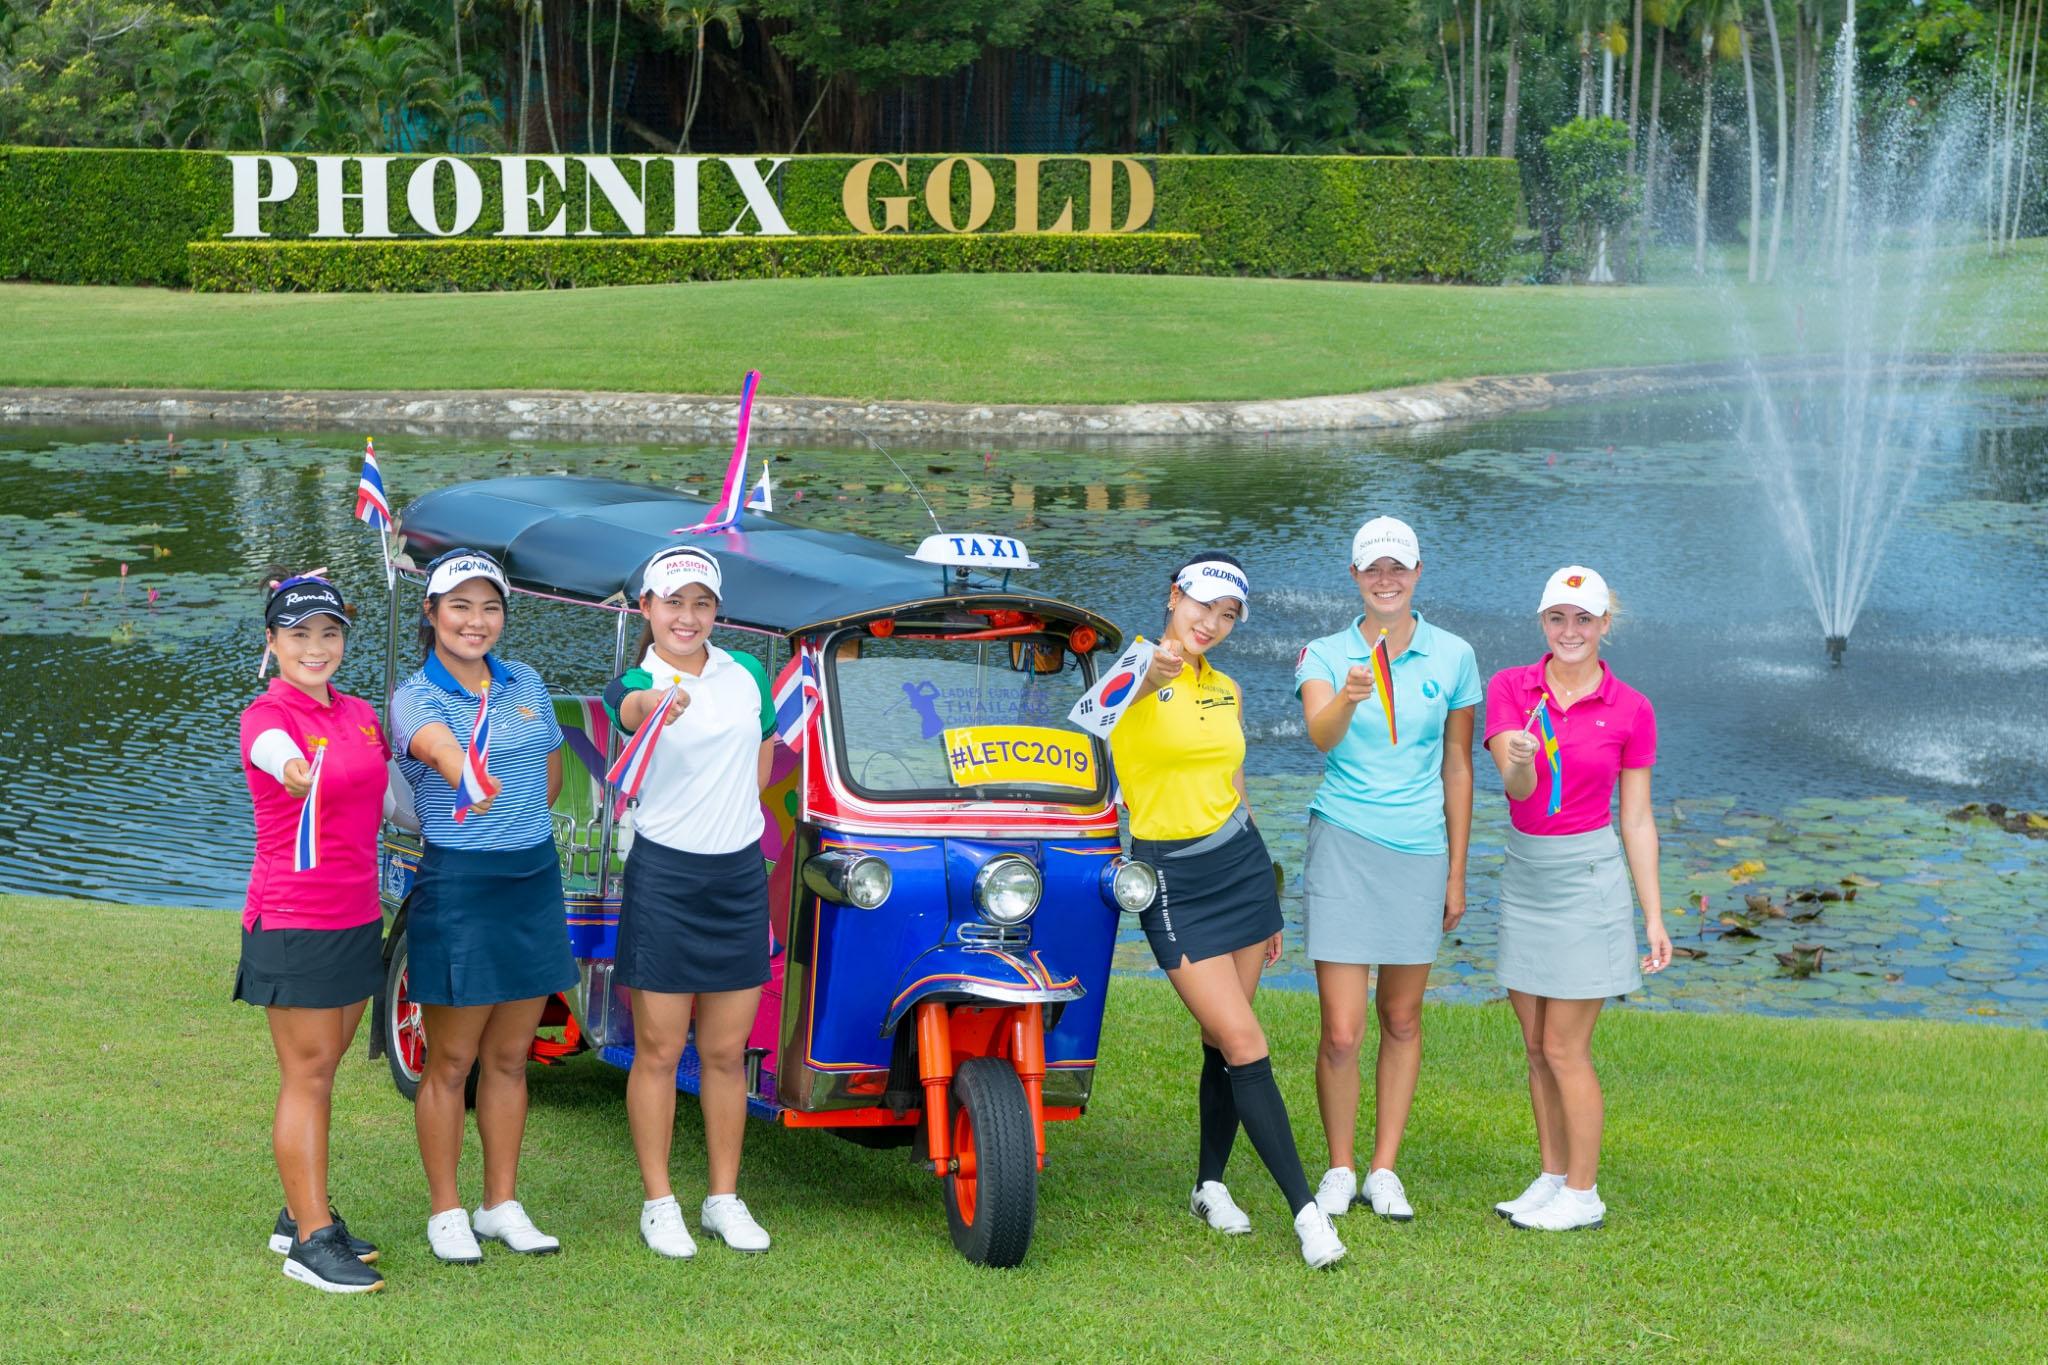 Caption (L to R): Defending champion Kanyalak Preedasuttijit, Chonlada Chayanun, Atthaya Thitikul, Hyun Ju Yoo, Esther Henseleit and Julia Engstrom at a photocall at Phoenix Gold Golf & Country Club on Tuesday.